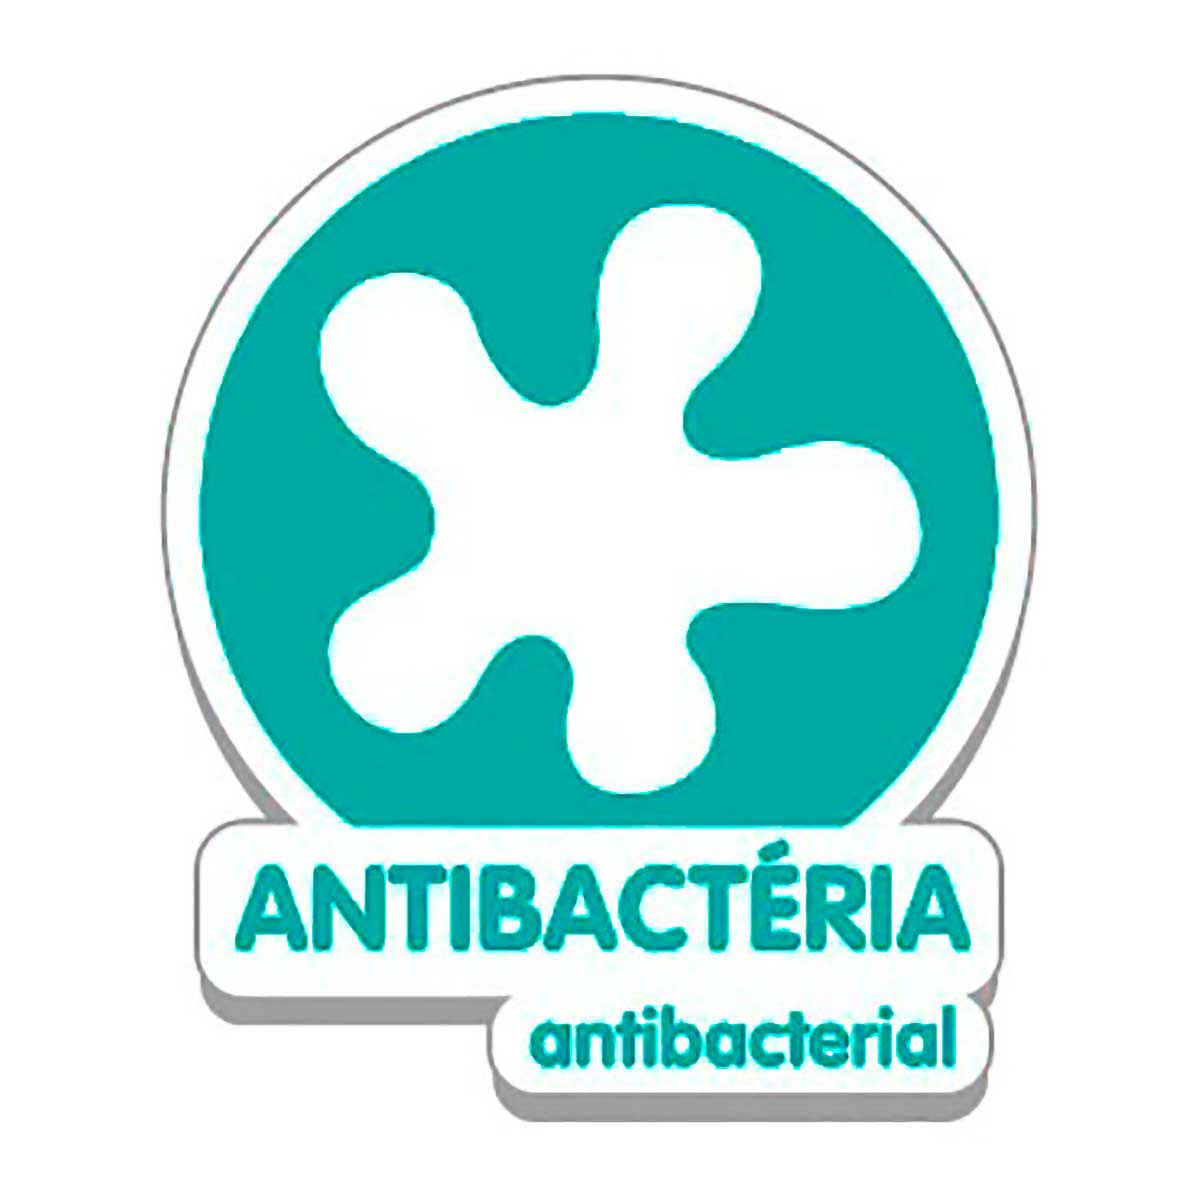 Conjunto de Potes Retangular Grande Antibactéria 3 pç